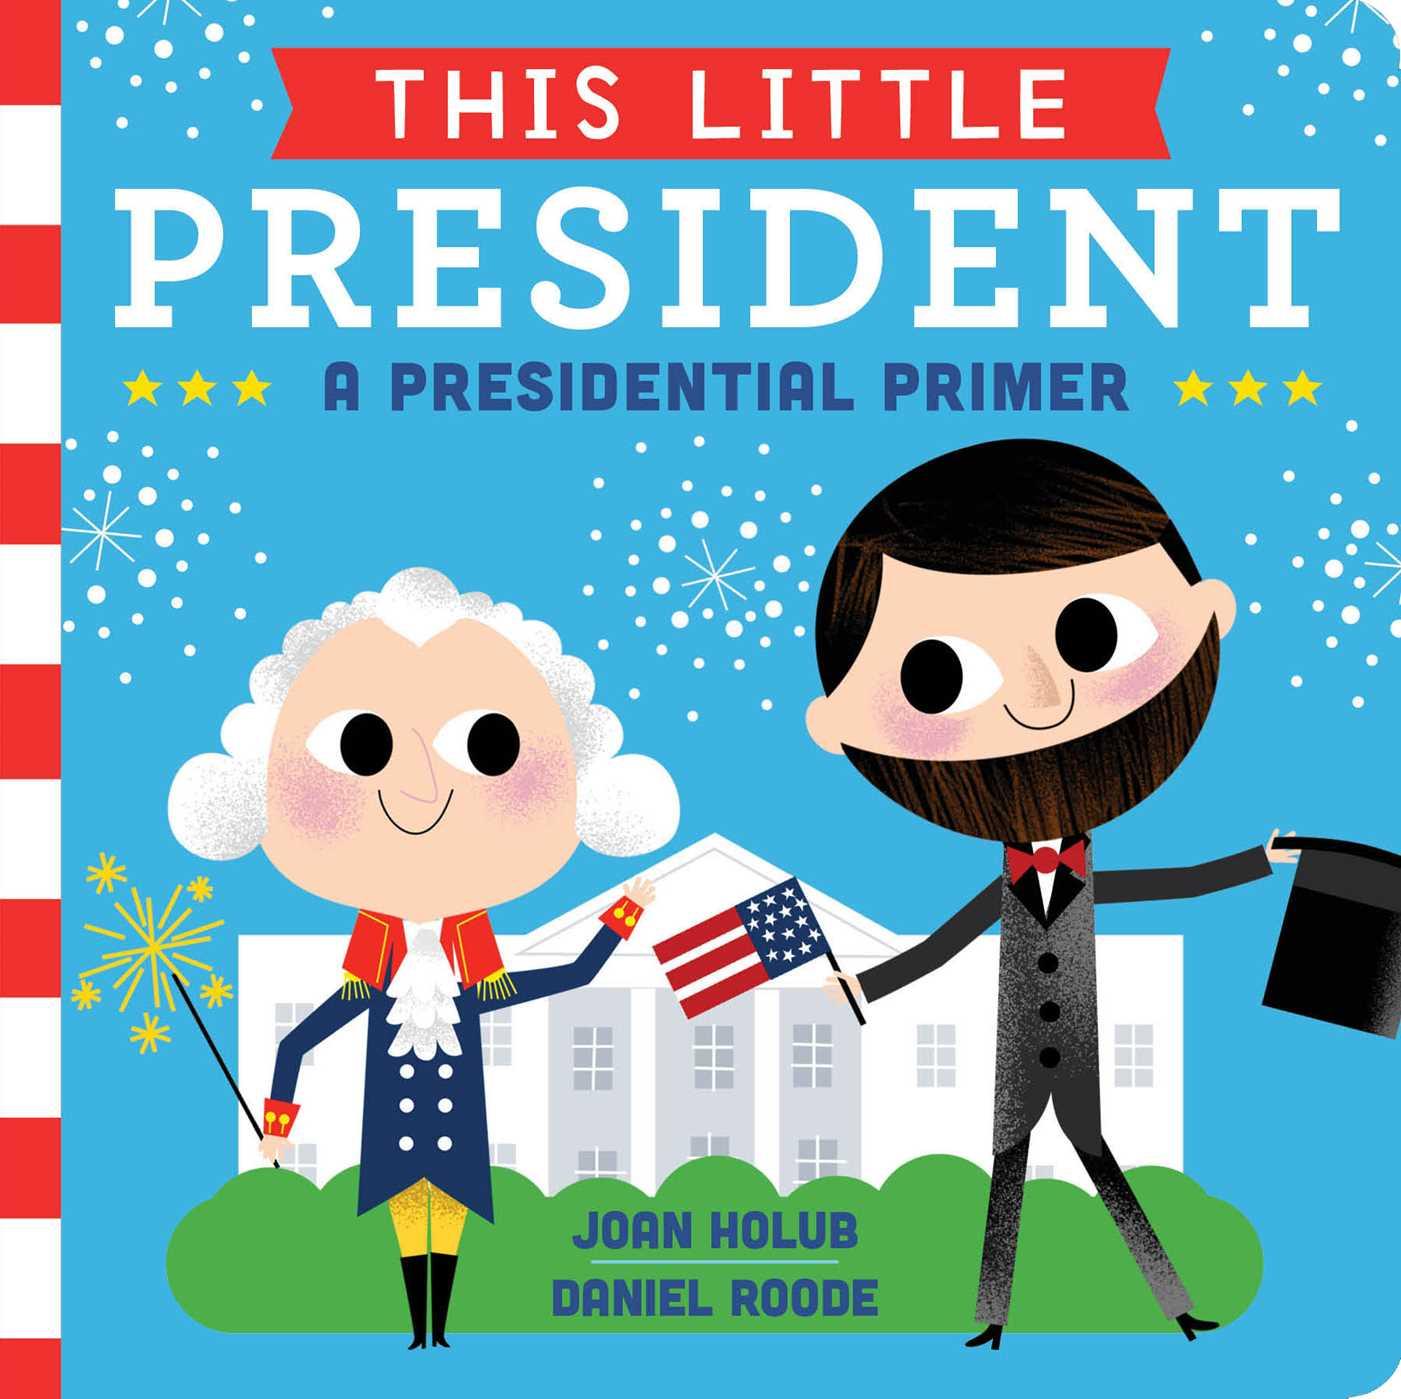 This little president 9781481458504 hr